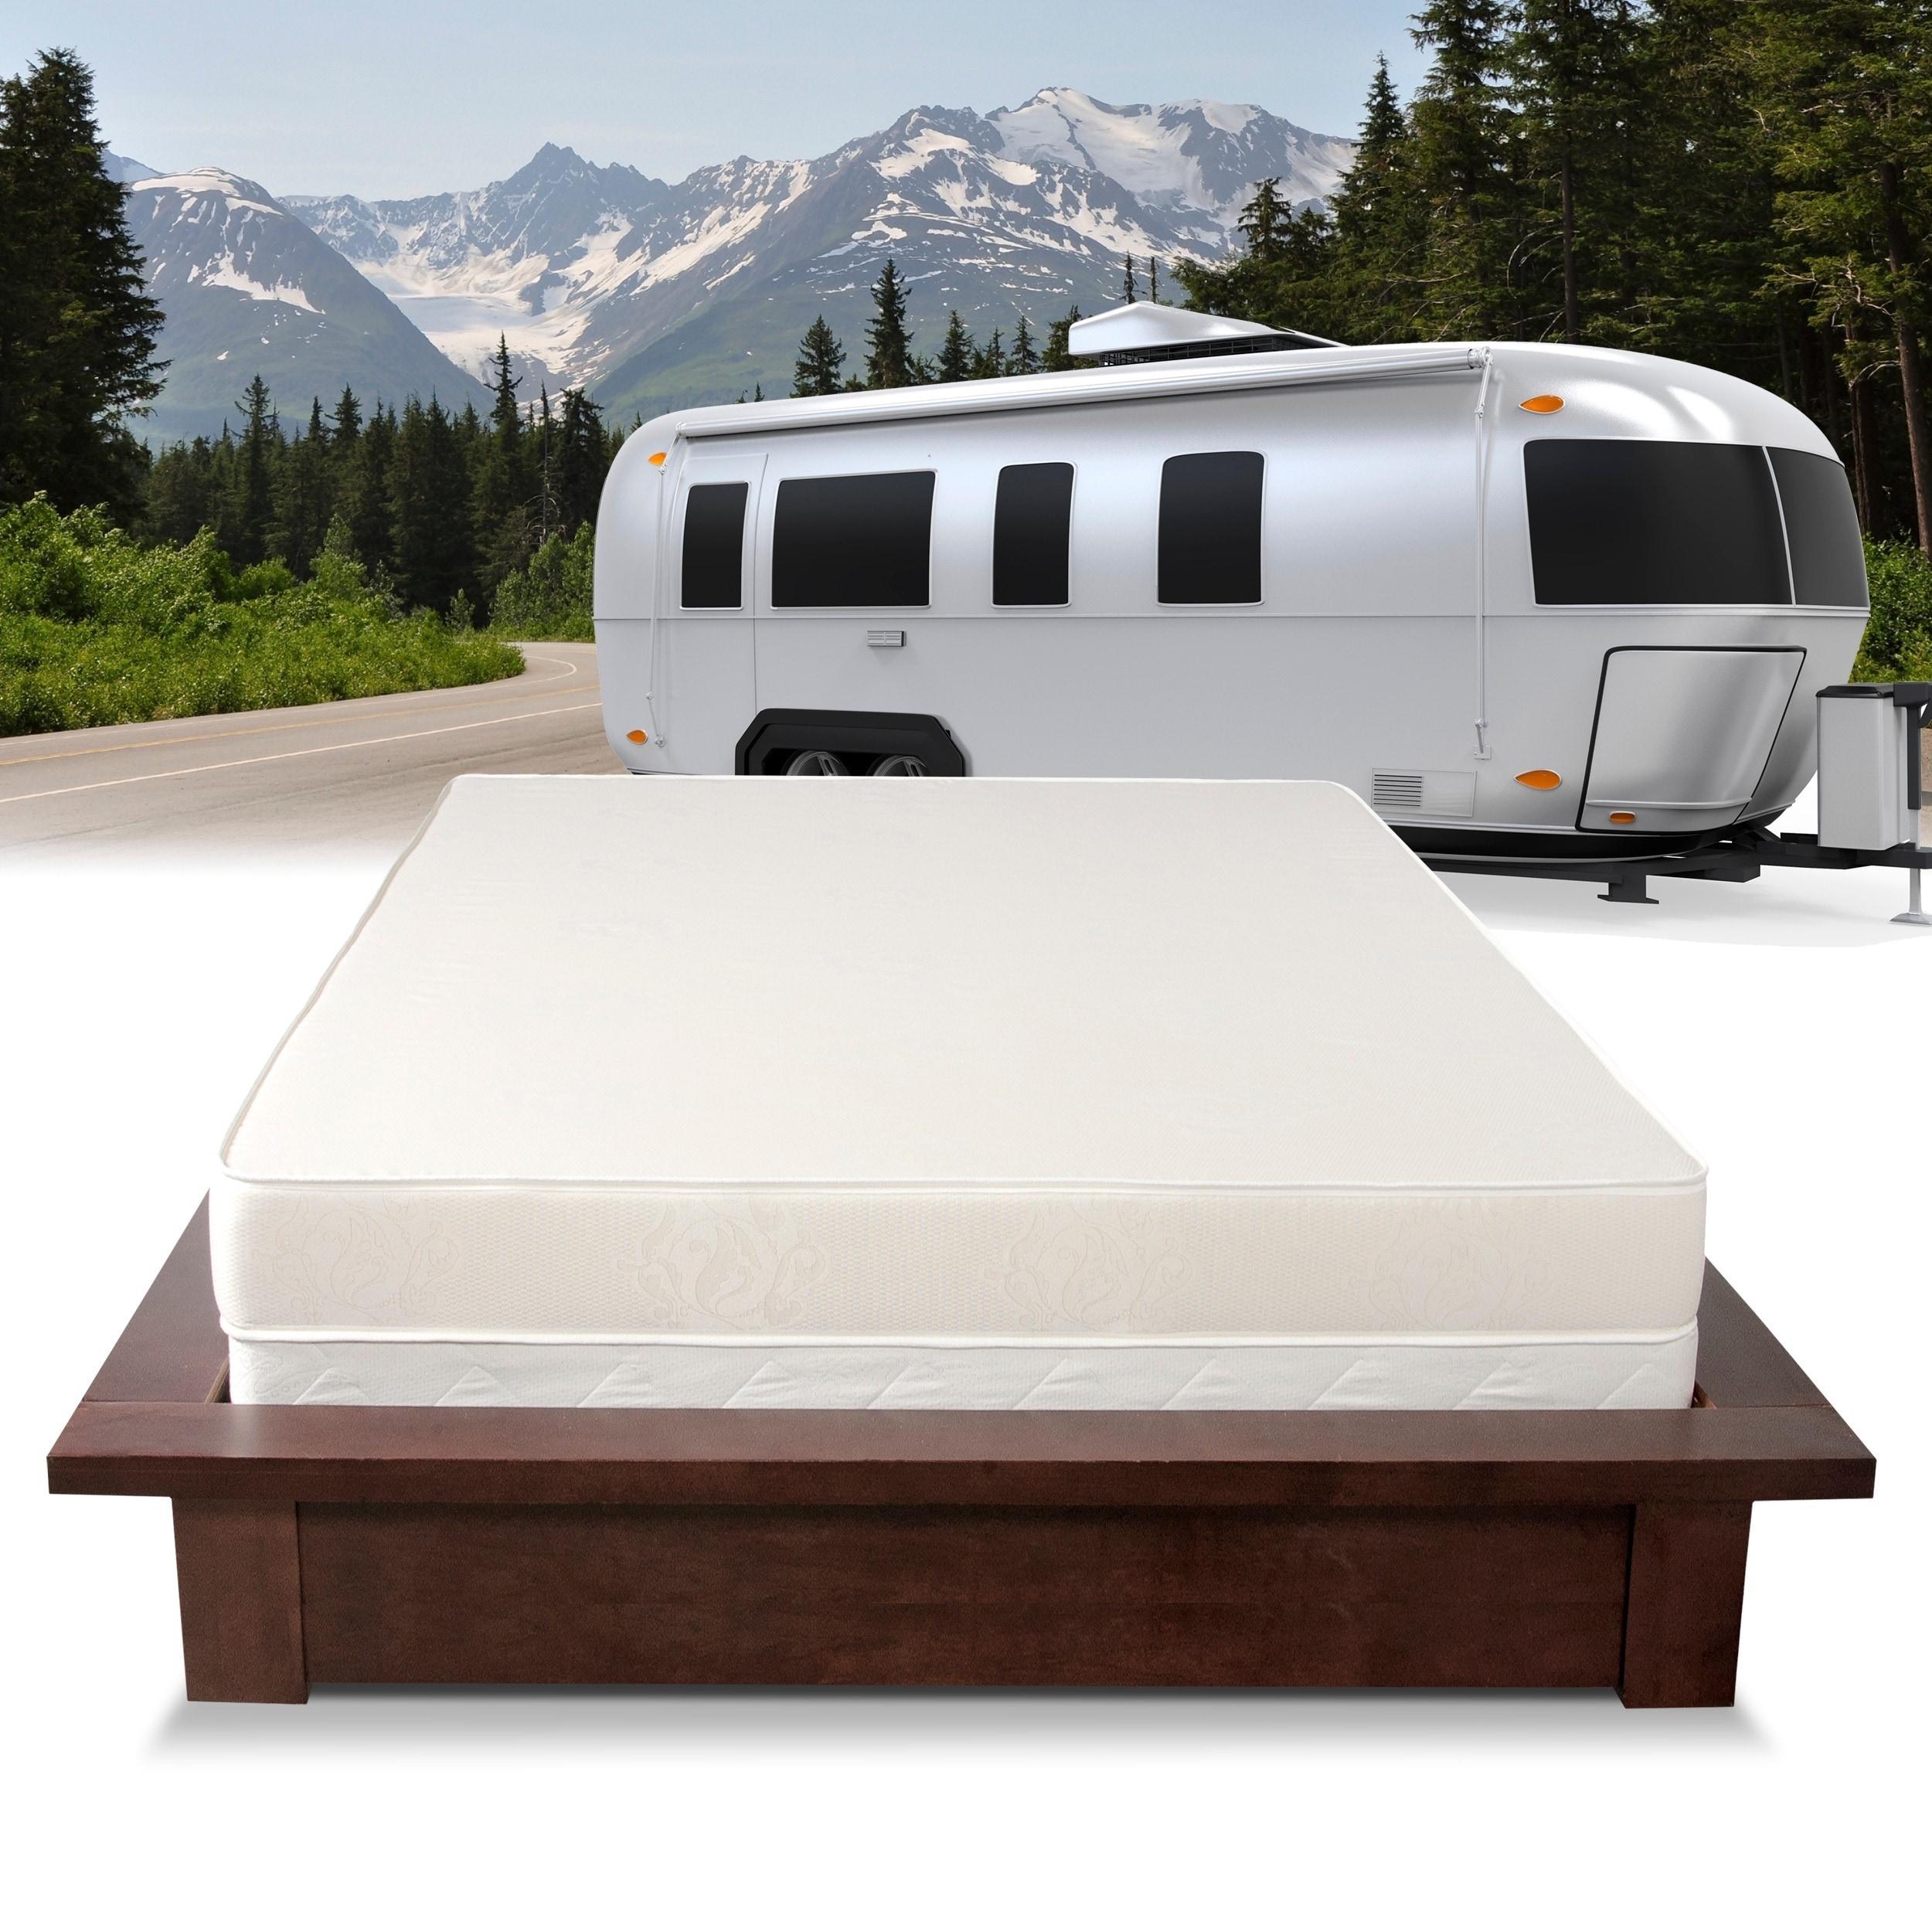 foam for memory sleep queen serenia rx your short rv mattress inch review